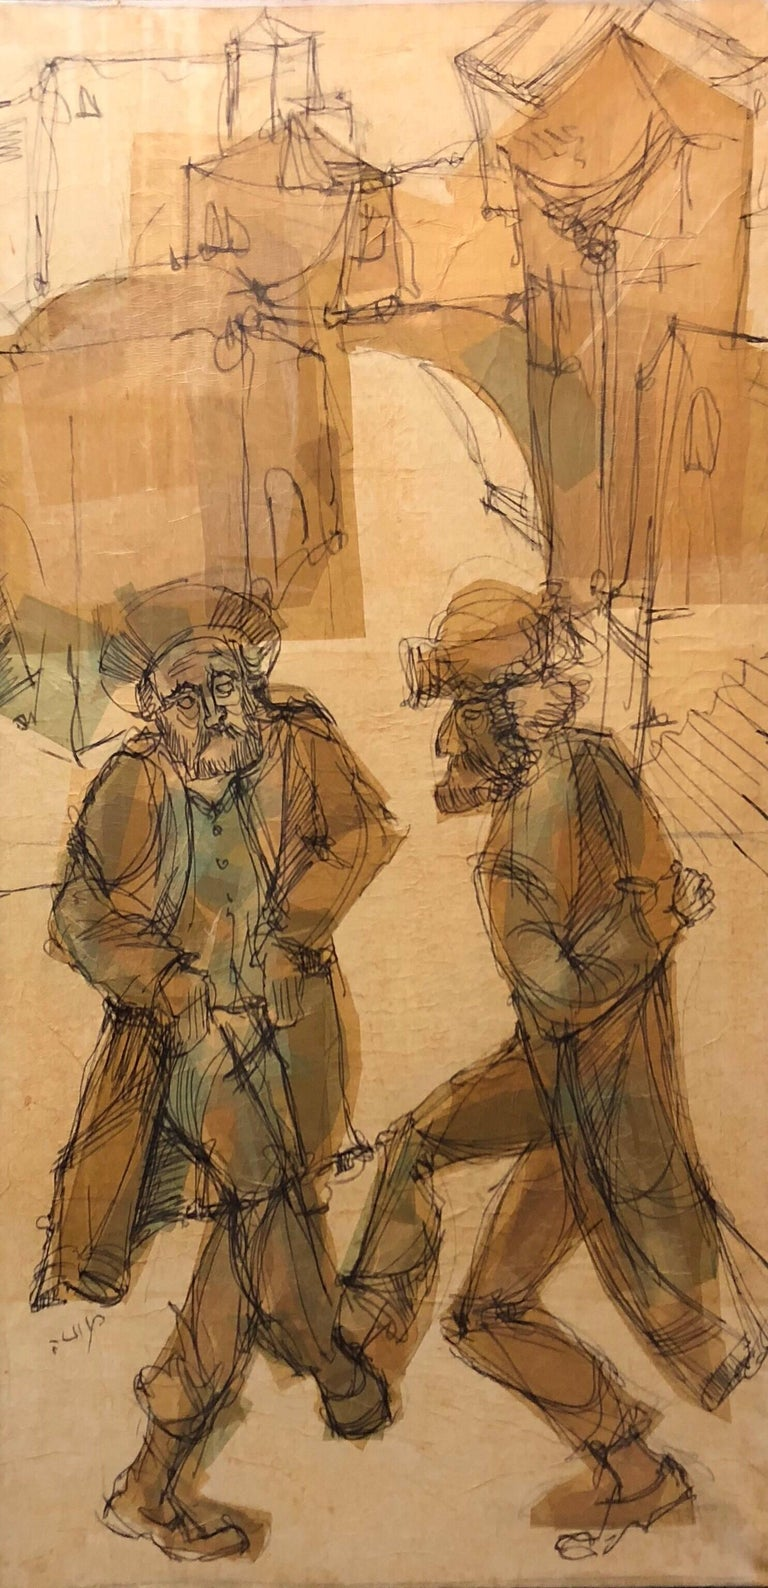 Israeli Rabbis Dancing in Jerusalem, Judaica, Mixed Media Painting - Brown Portrait Painting by Moshe Katz